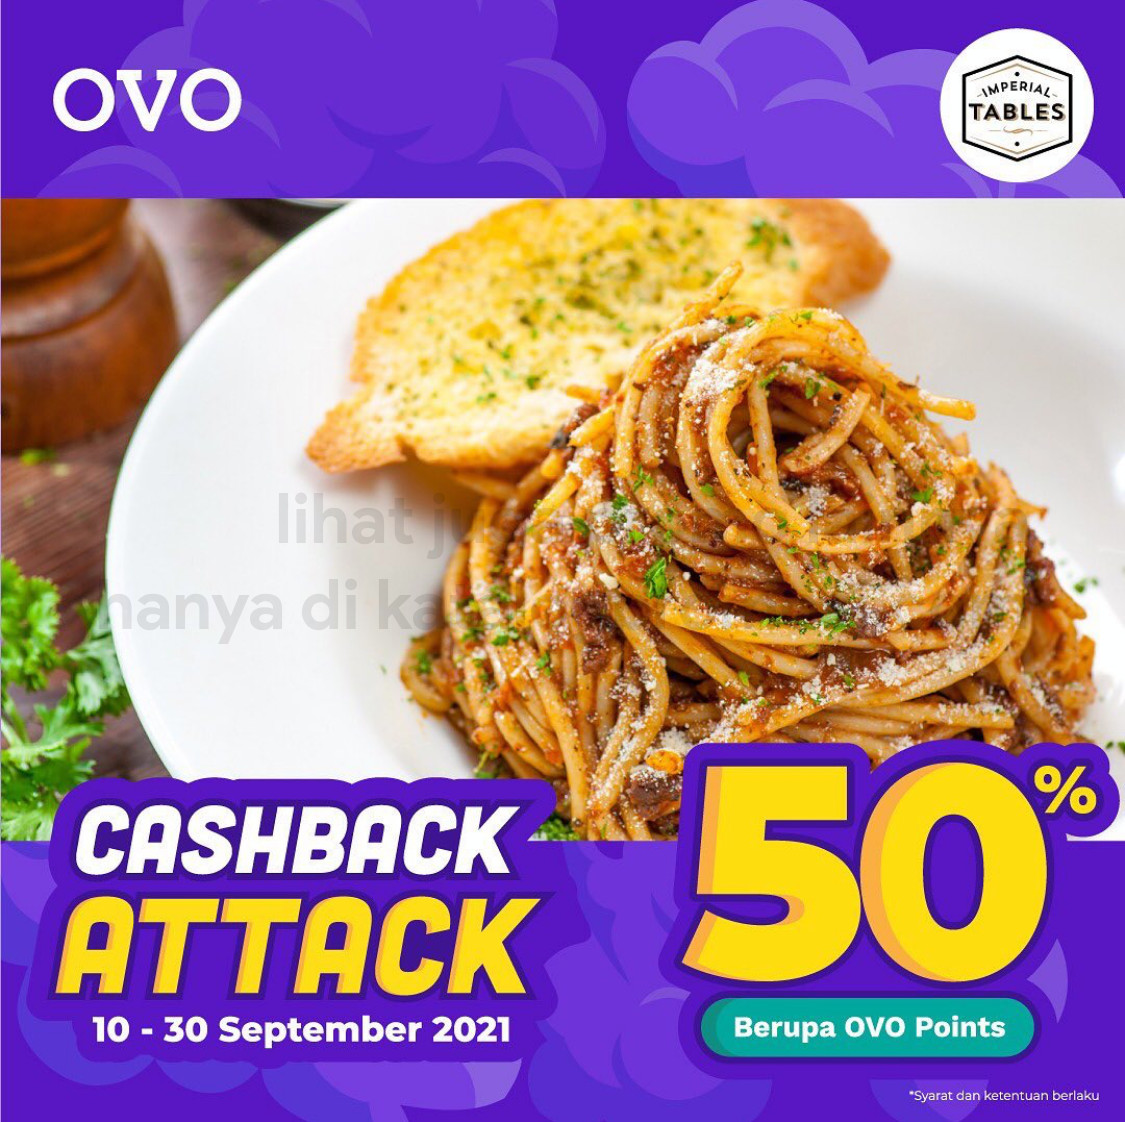 Promo IMPERIAL TABLES CASHBACK 50% untuk transaksi pakai OVO